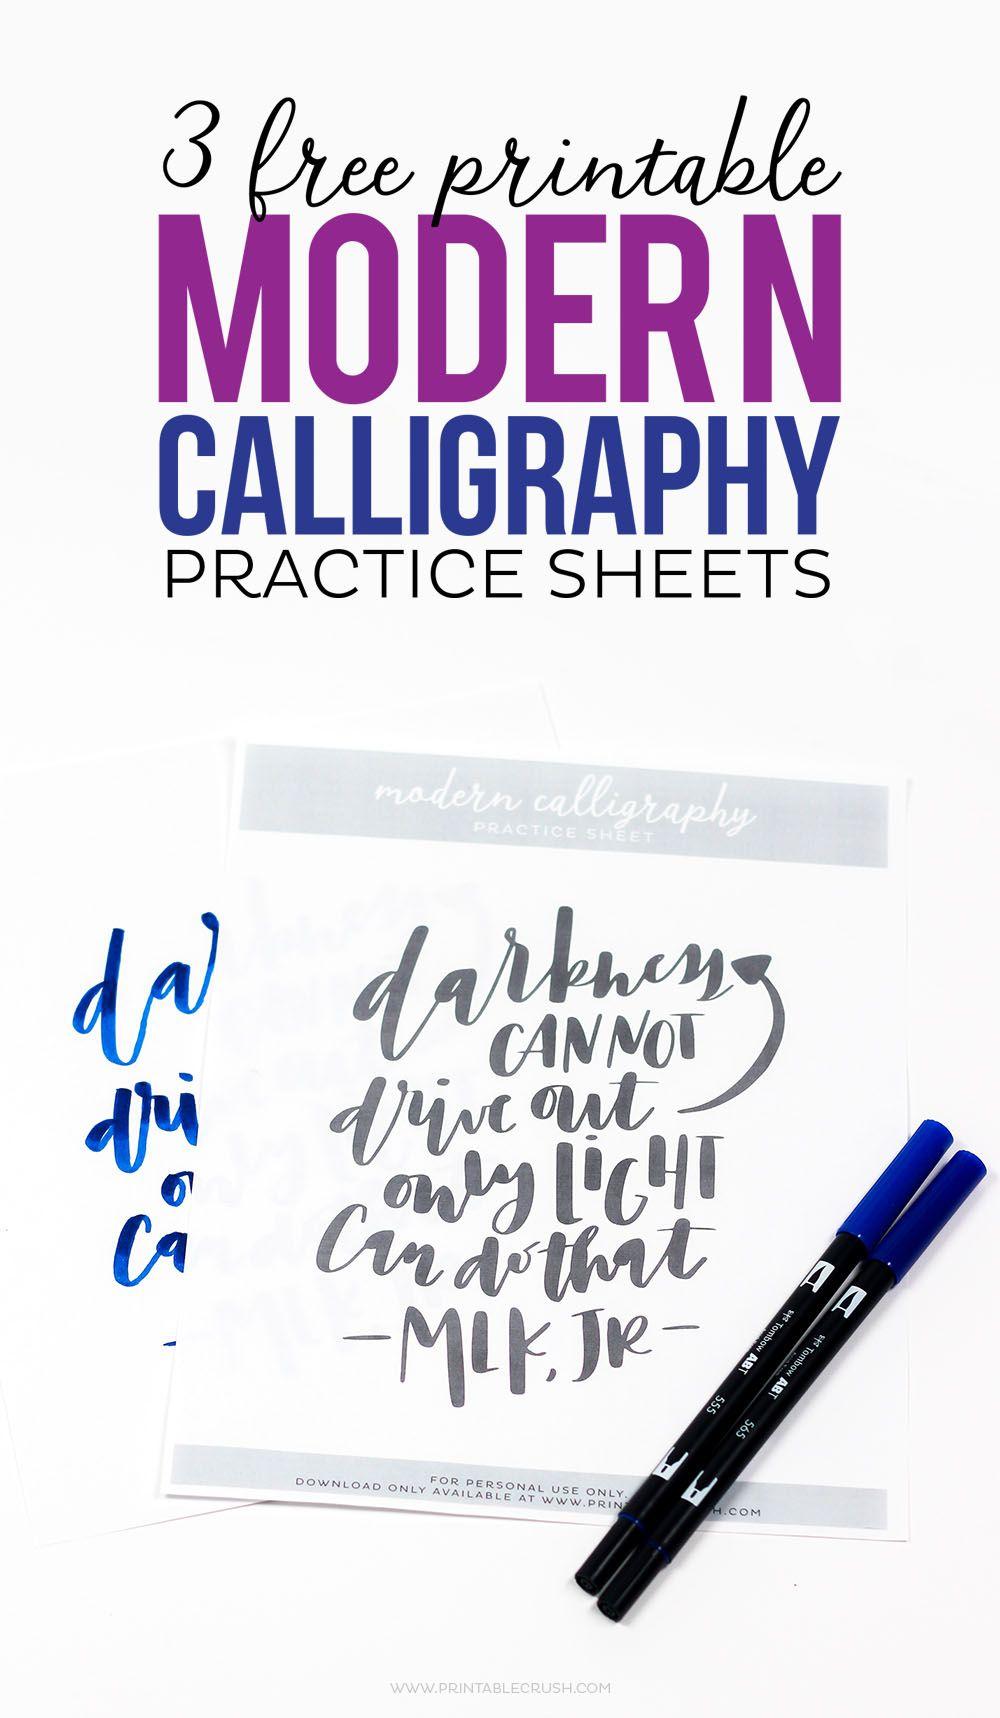 3 Free Printable Modern Calligraphy Practice Sheets (Printable Crush - Modern Calligraphy Practice Sheets Printable Free